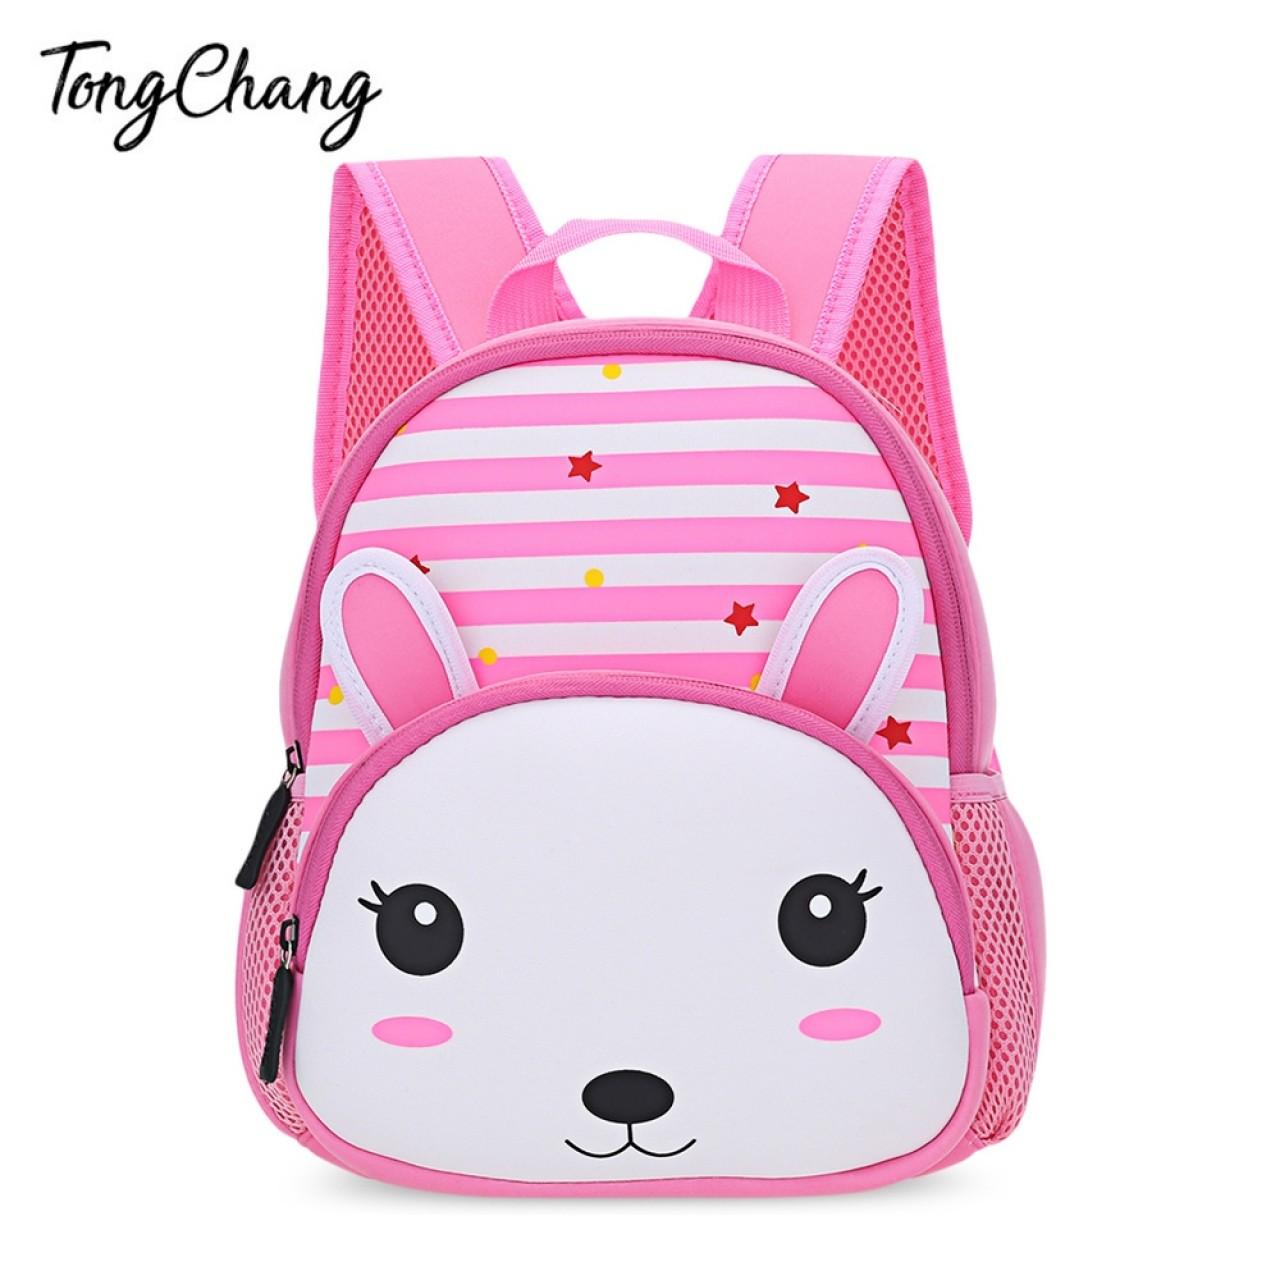 1f9a497c16 ... Παιδική τσάντα νηπιαγωγείου λαγουδάκι Παιδικά - Βρεφικά ...